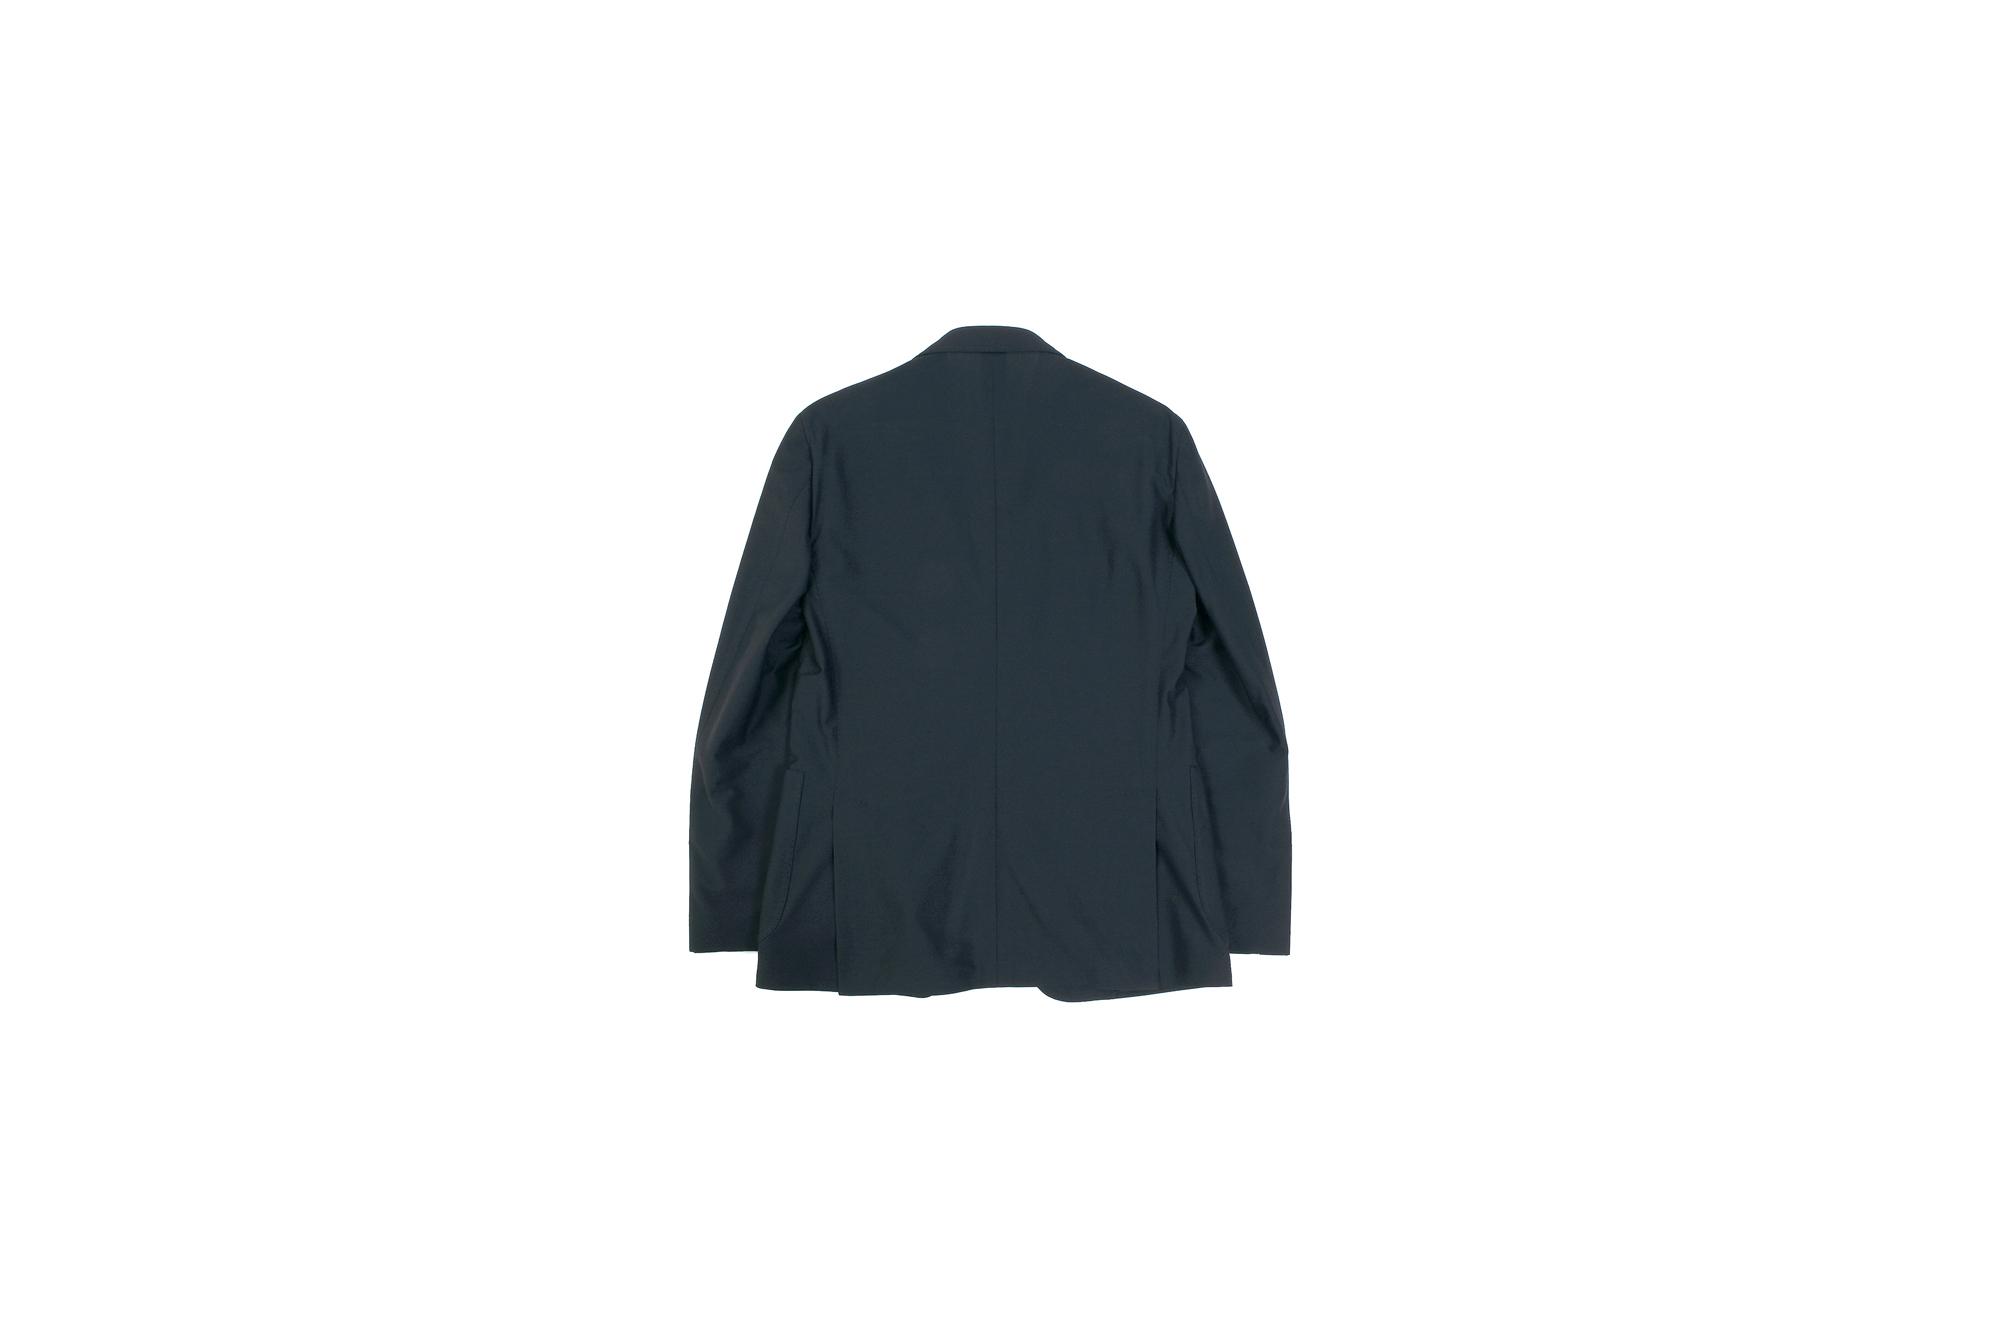 LARDINI (ラルディーニ) EASY WEAR (イージーウエア) Pakkaburu Suit パッカブル サマージャージ スーツ NAVY (ネイビー・1) Made in italy (イタリア製) 2020 春夏新作 愛知 名古屋 altoediritto アルトエデリッ